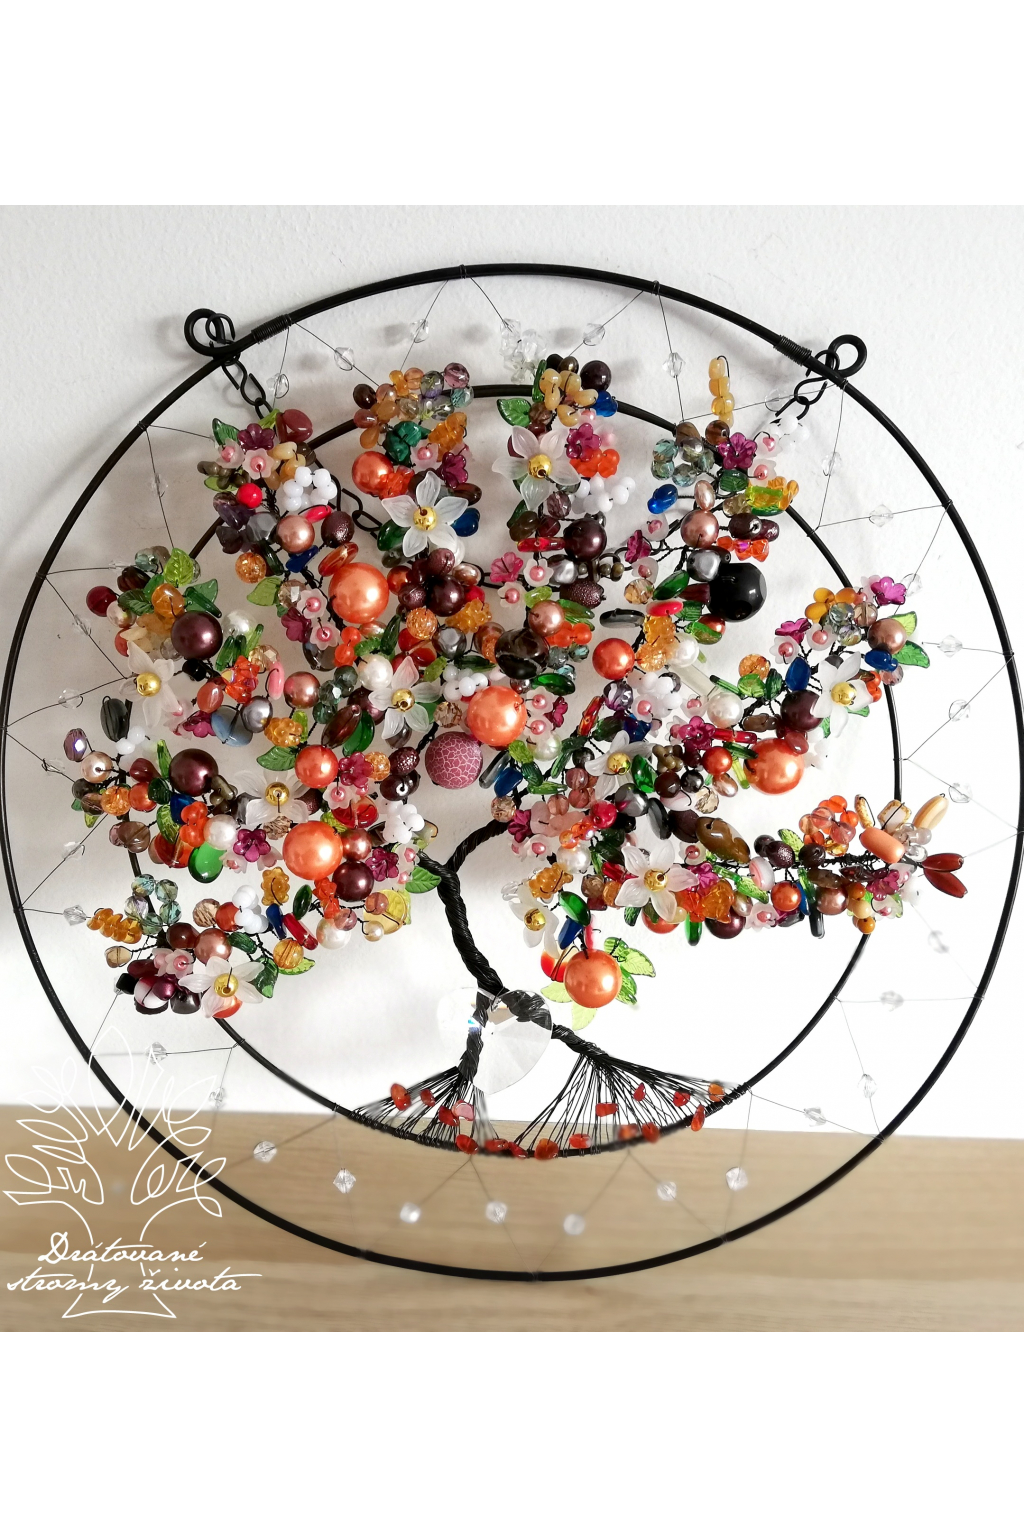 Drátovaný strom - Bohatství a berevnost života 35cm